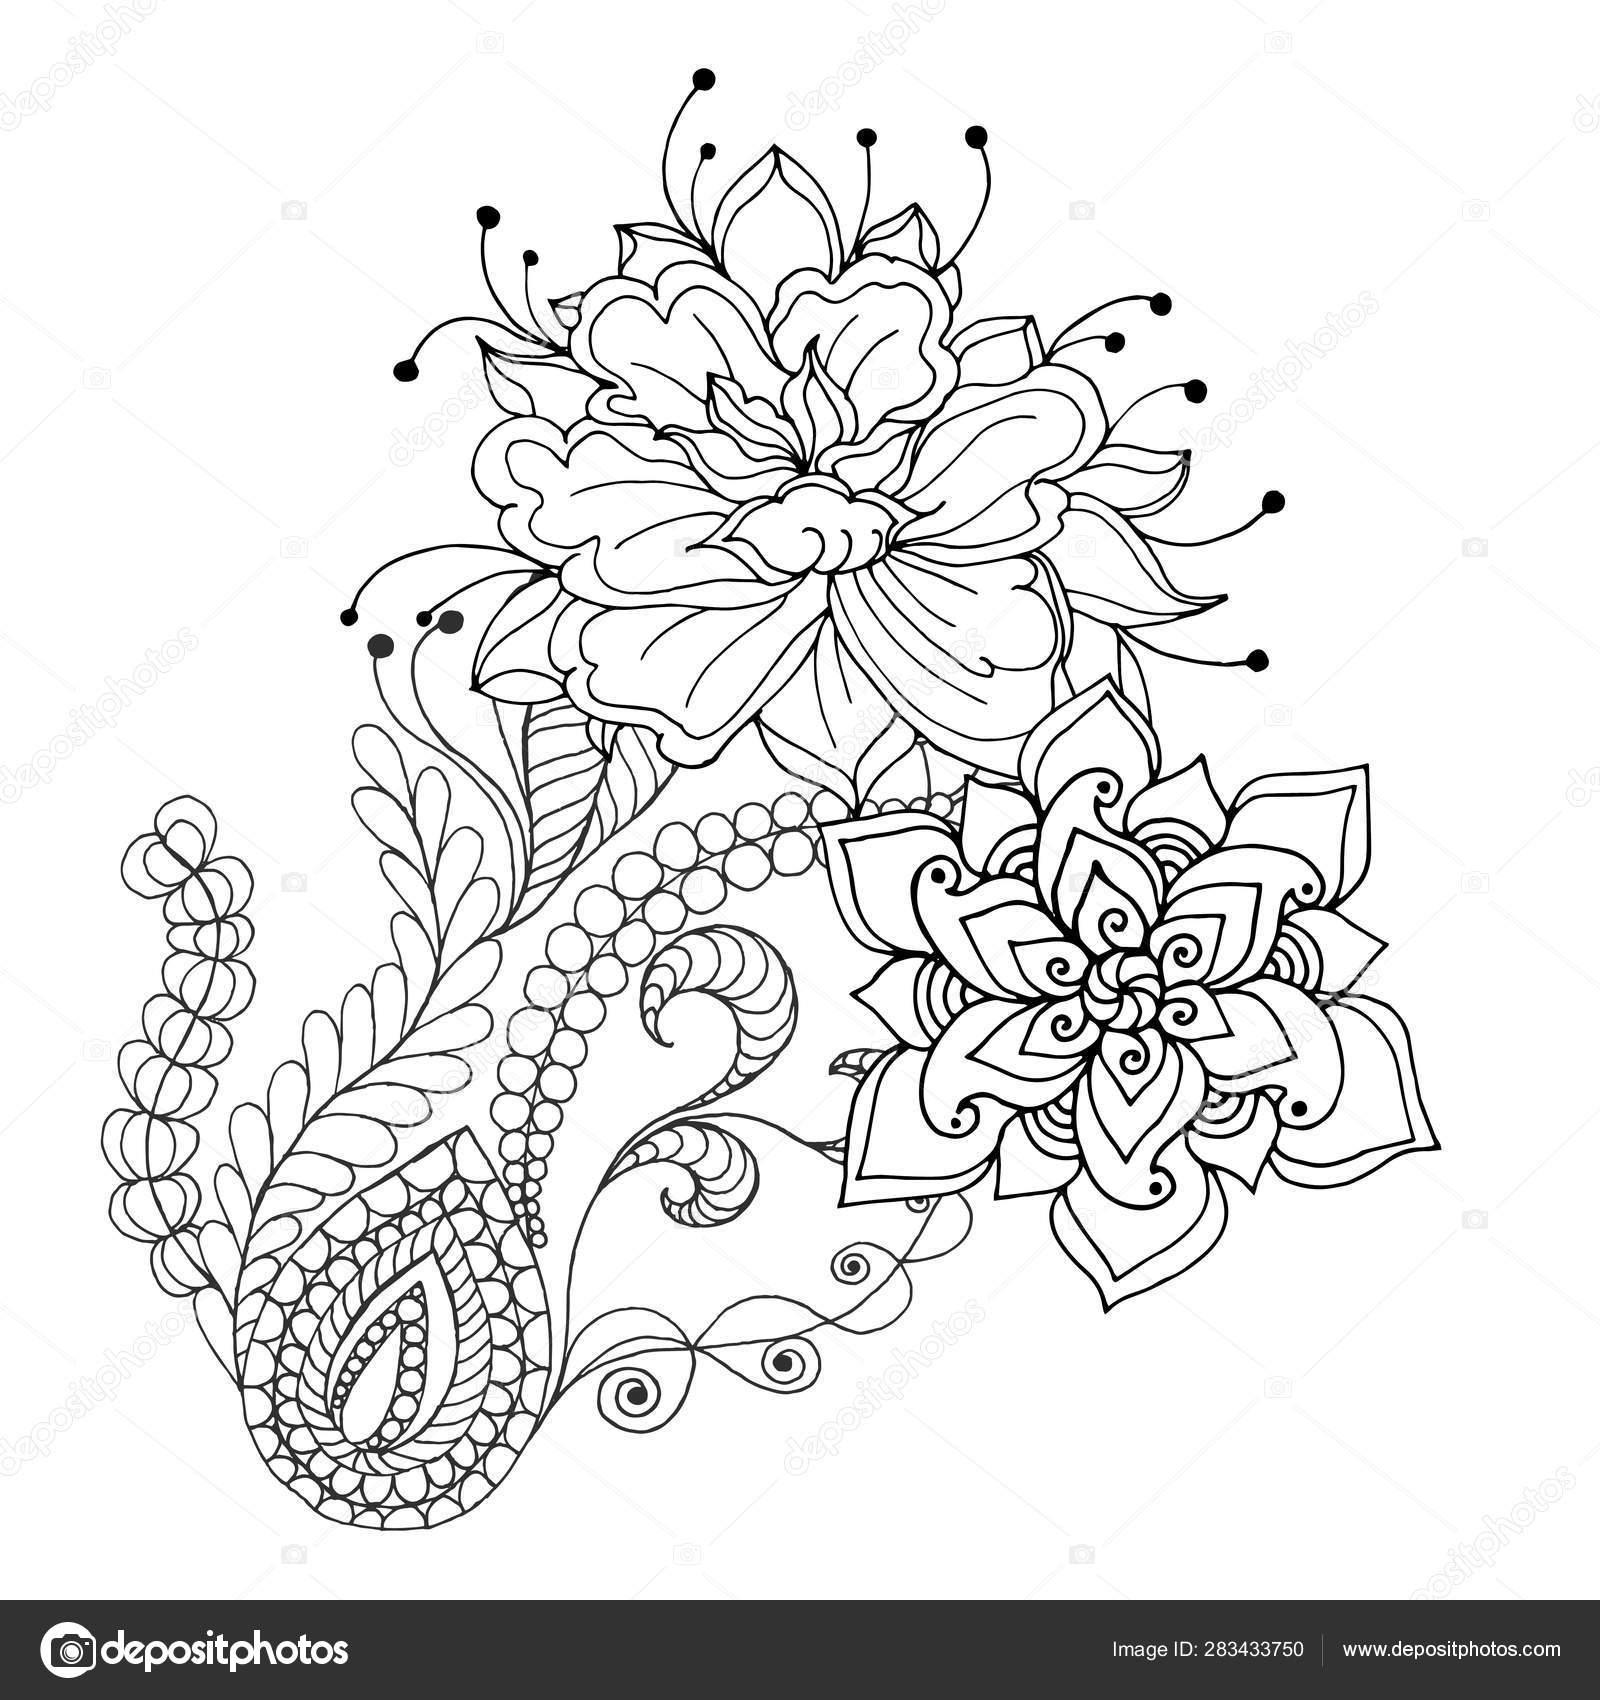 14 Mandala Sunflower Mandala Coloring Pages Beautiful Cool Vases ... | 1700x1600